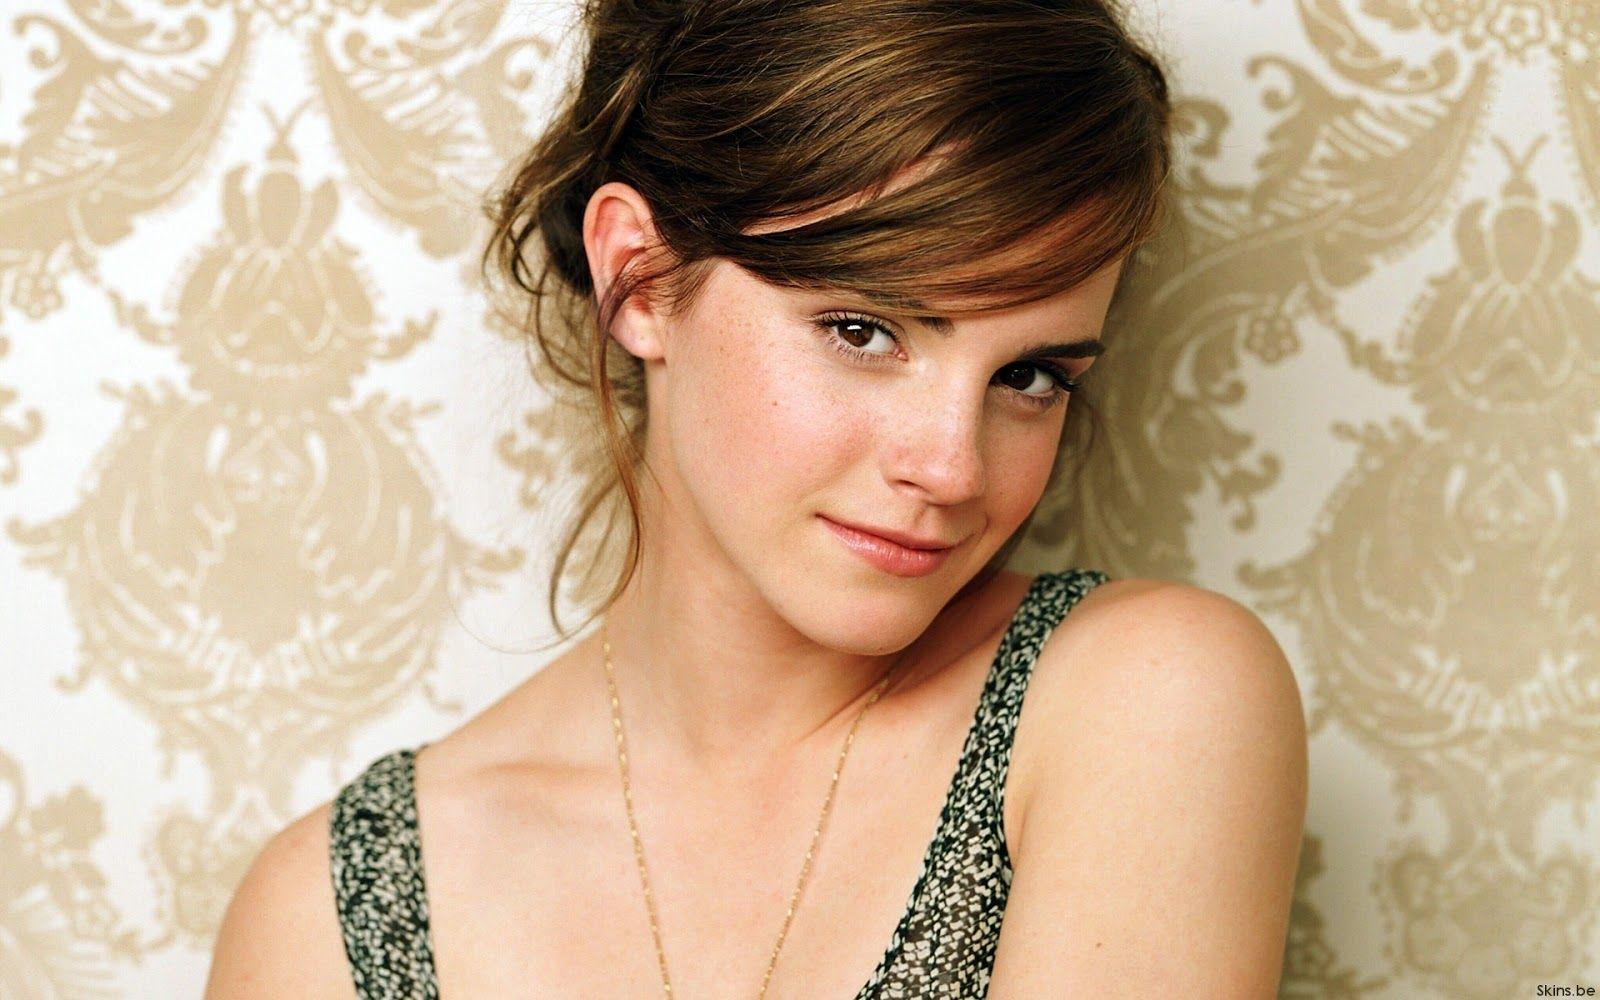 Emma-Watson-emma-watson-18878962-1920-1200.jpg (1600×1000